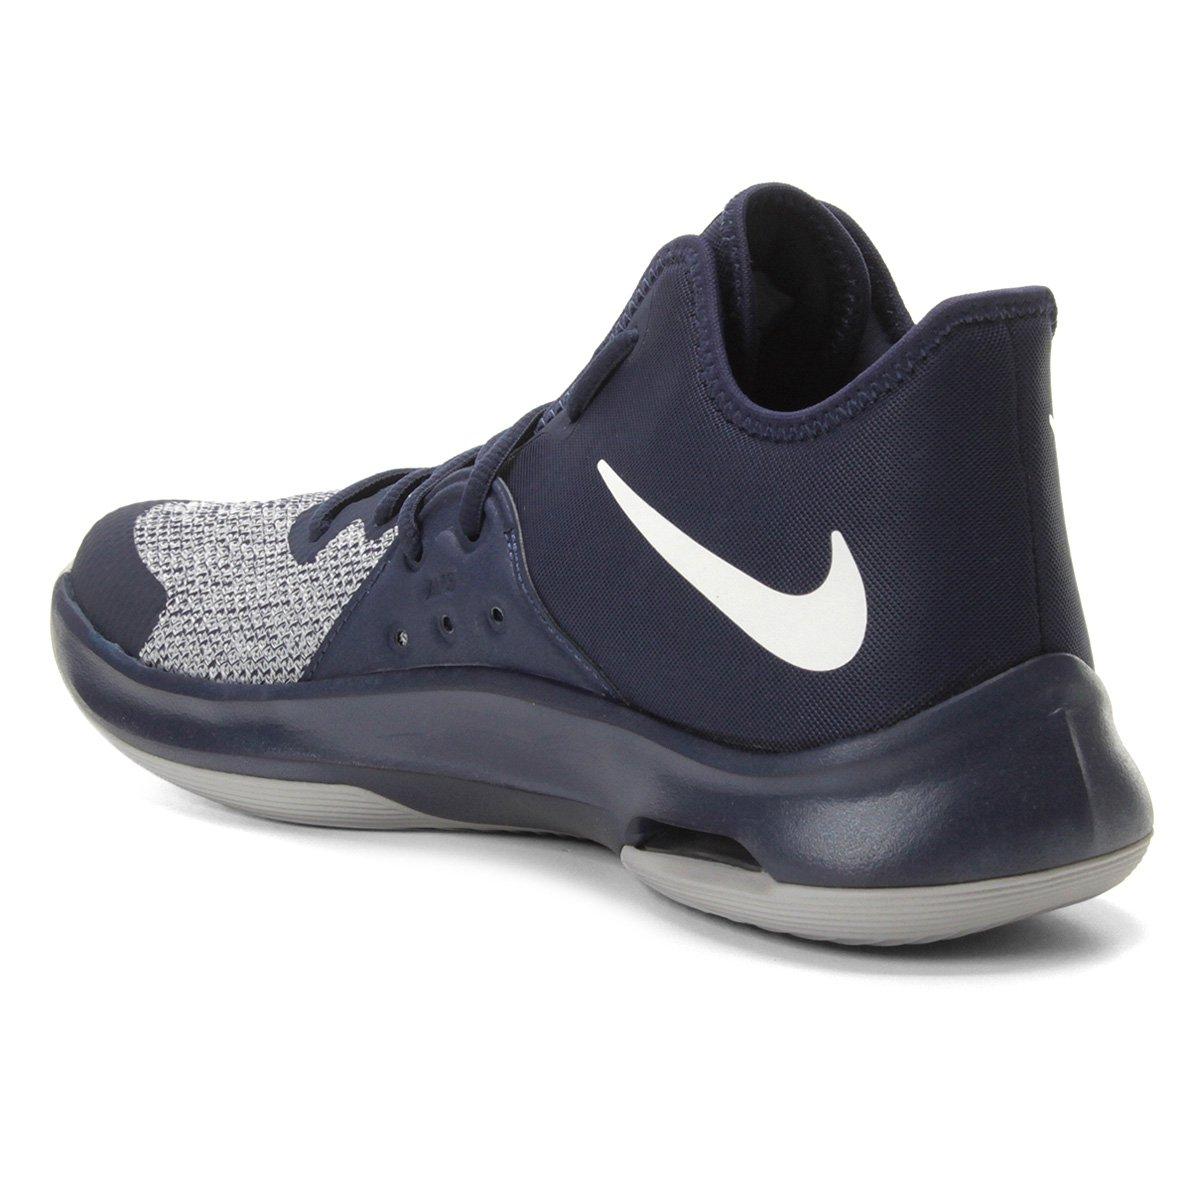 Tênis Nike Air Versitile III Masculino - 1